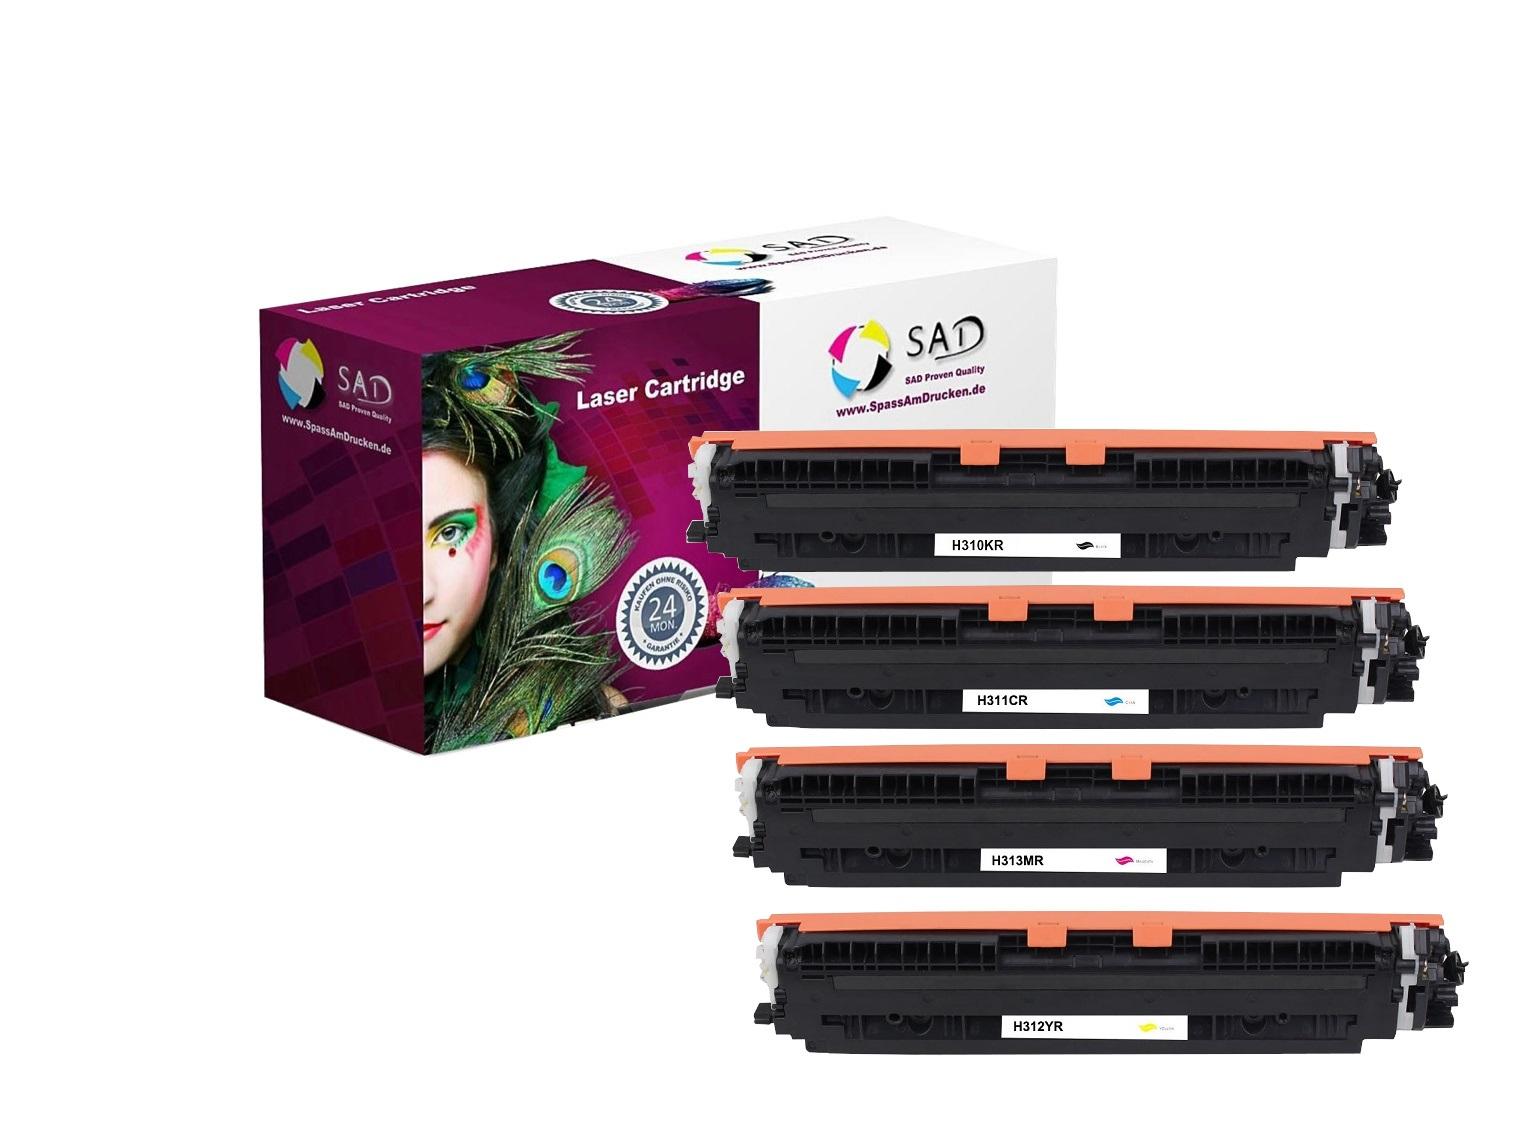 SAD MultiPack Premium Toner kompatibel mit HP CE310A / CE311A / CE312A / CE313A / 126A schwarz cyan